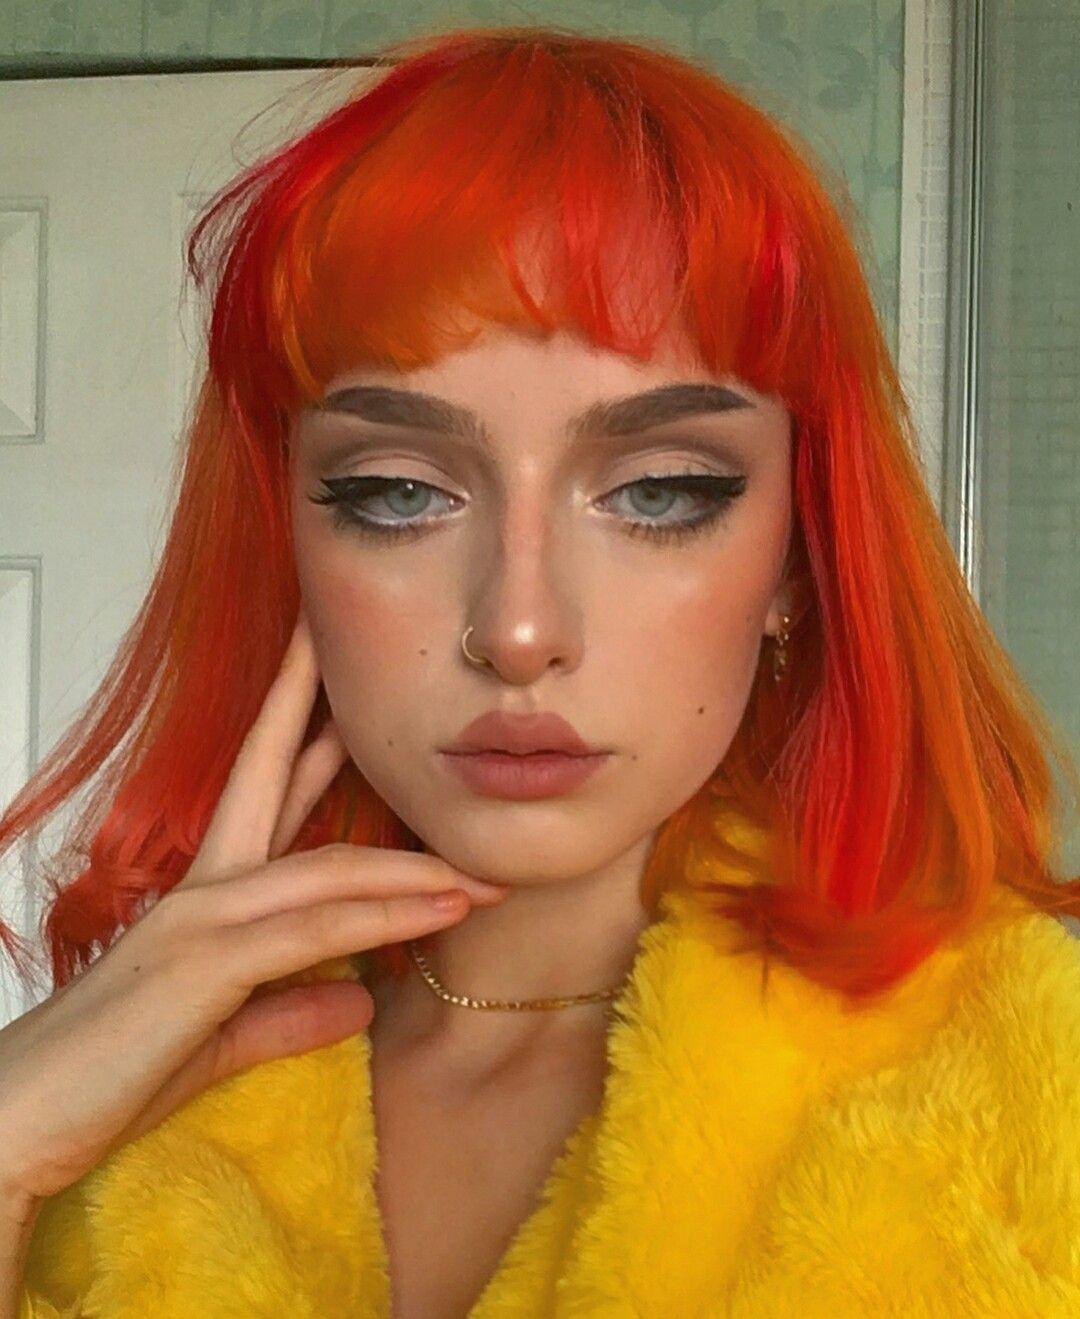 Lime Crime Aesthetic Hair Dye Review